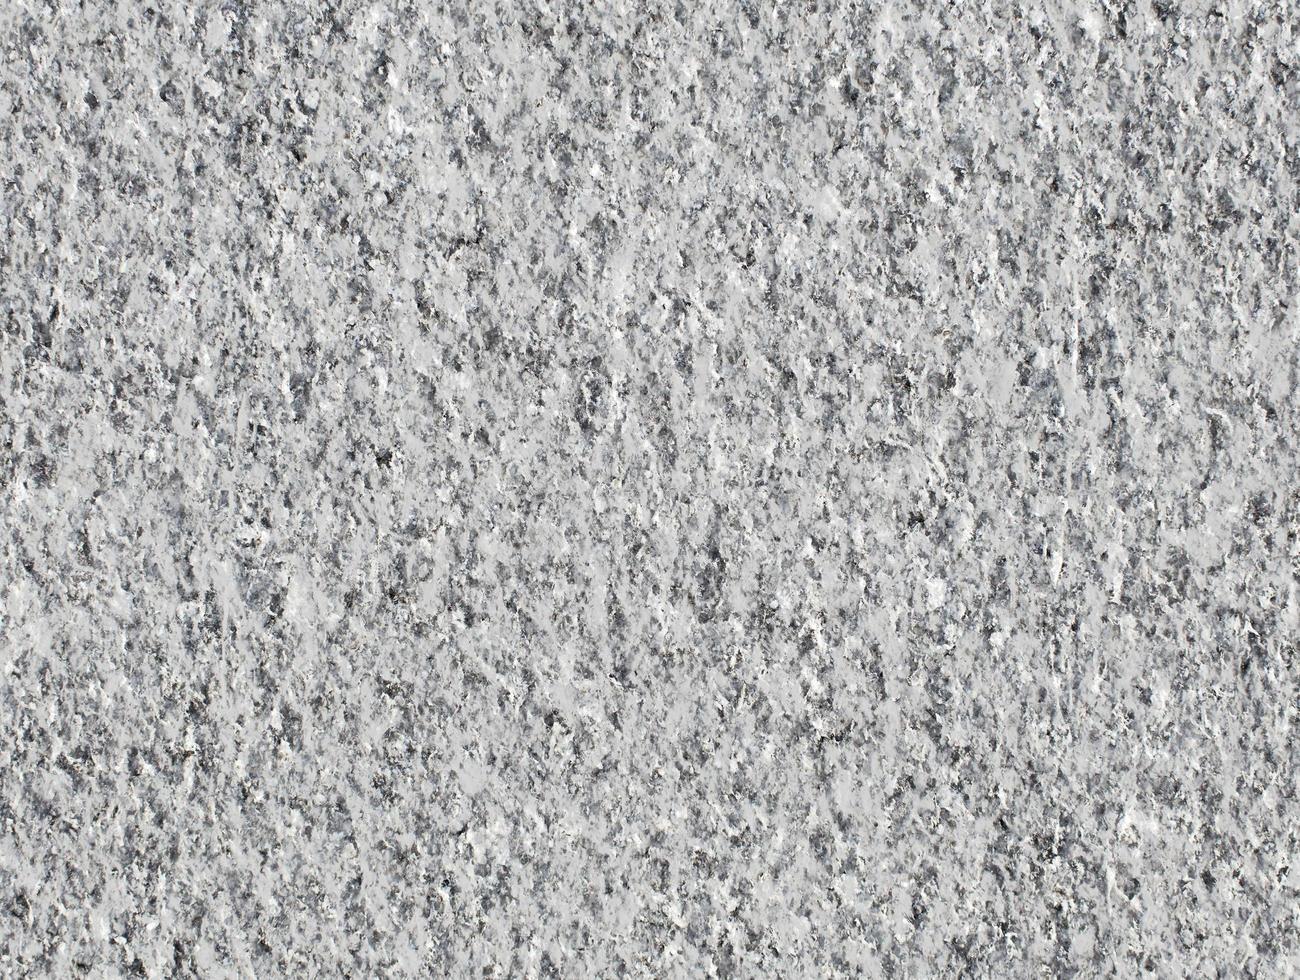 Granite wall texture photo